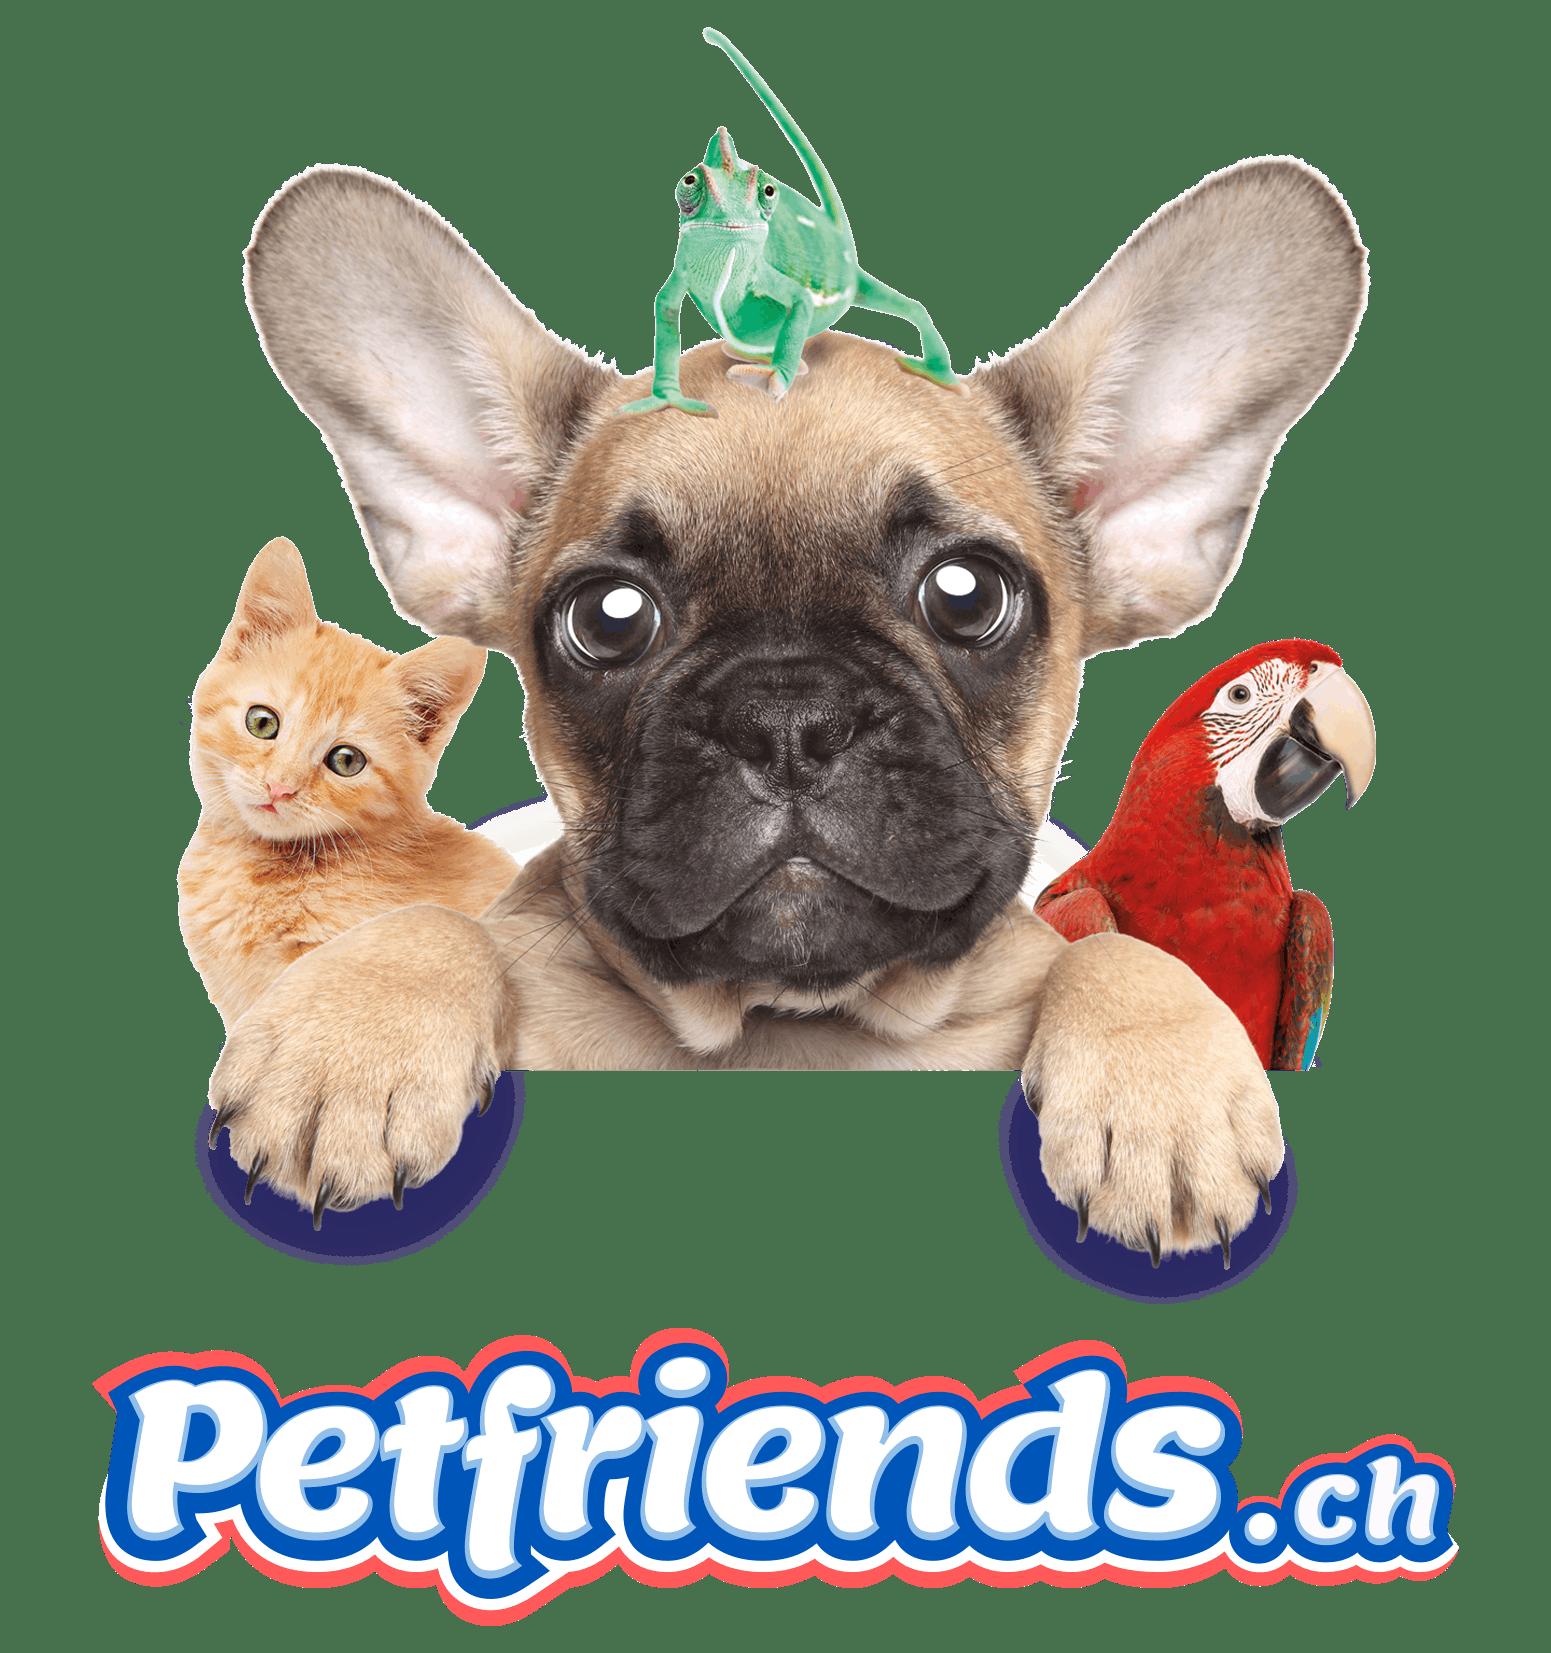 Petfriends Image